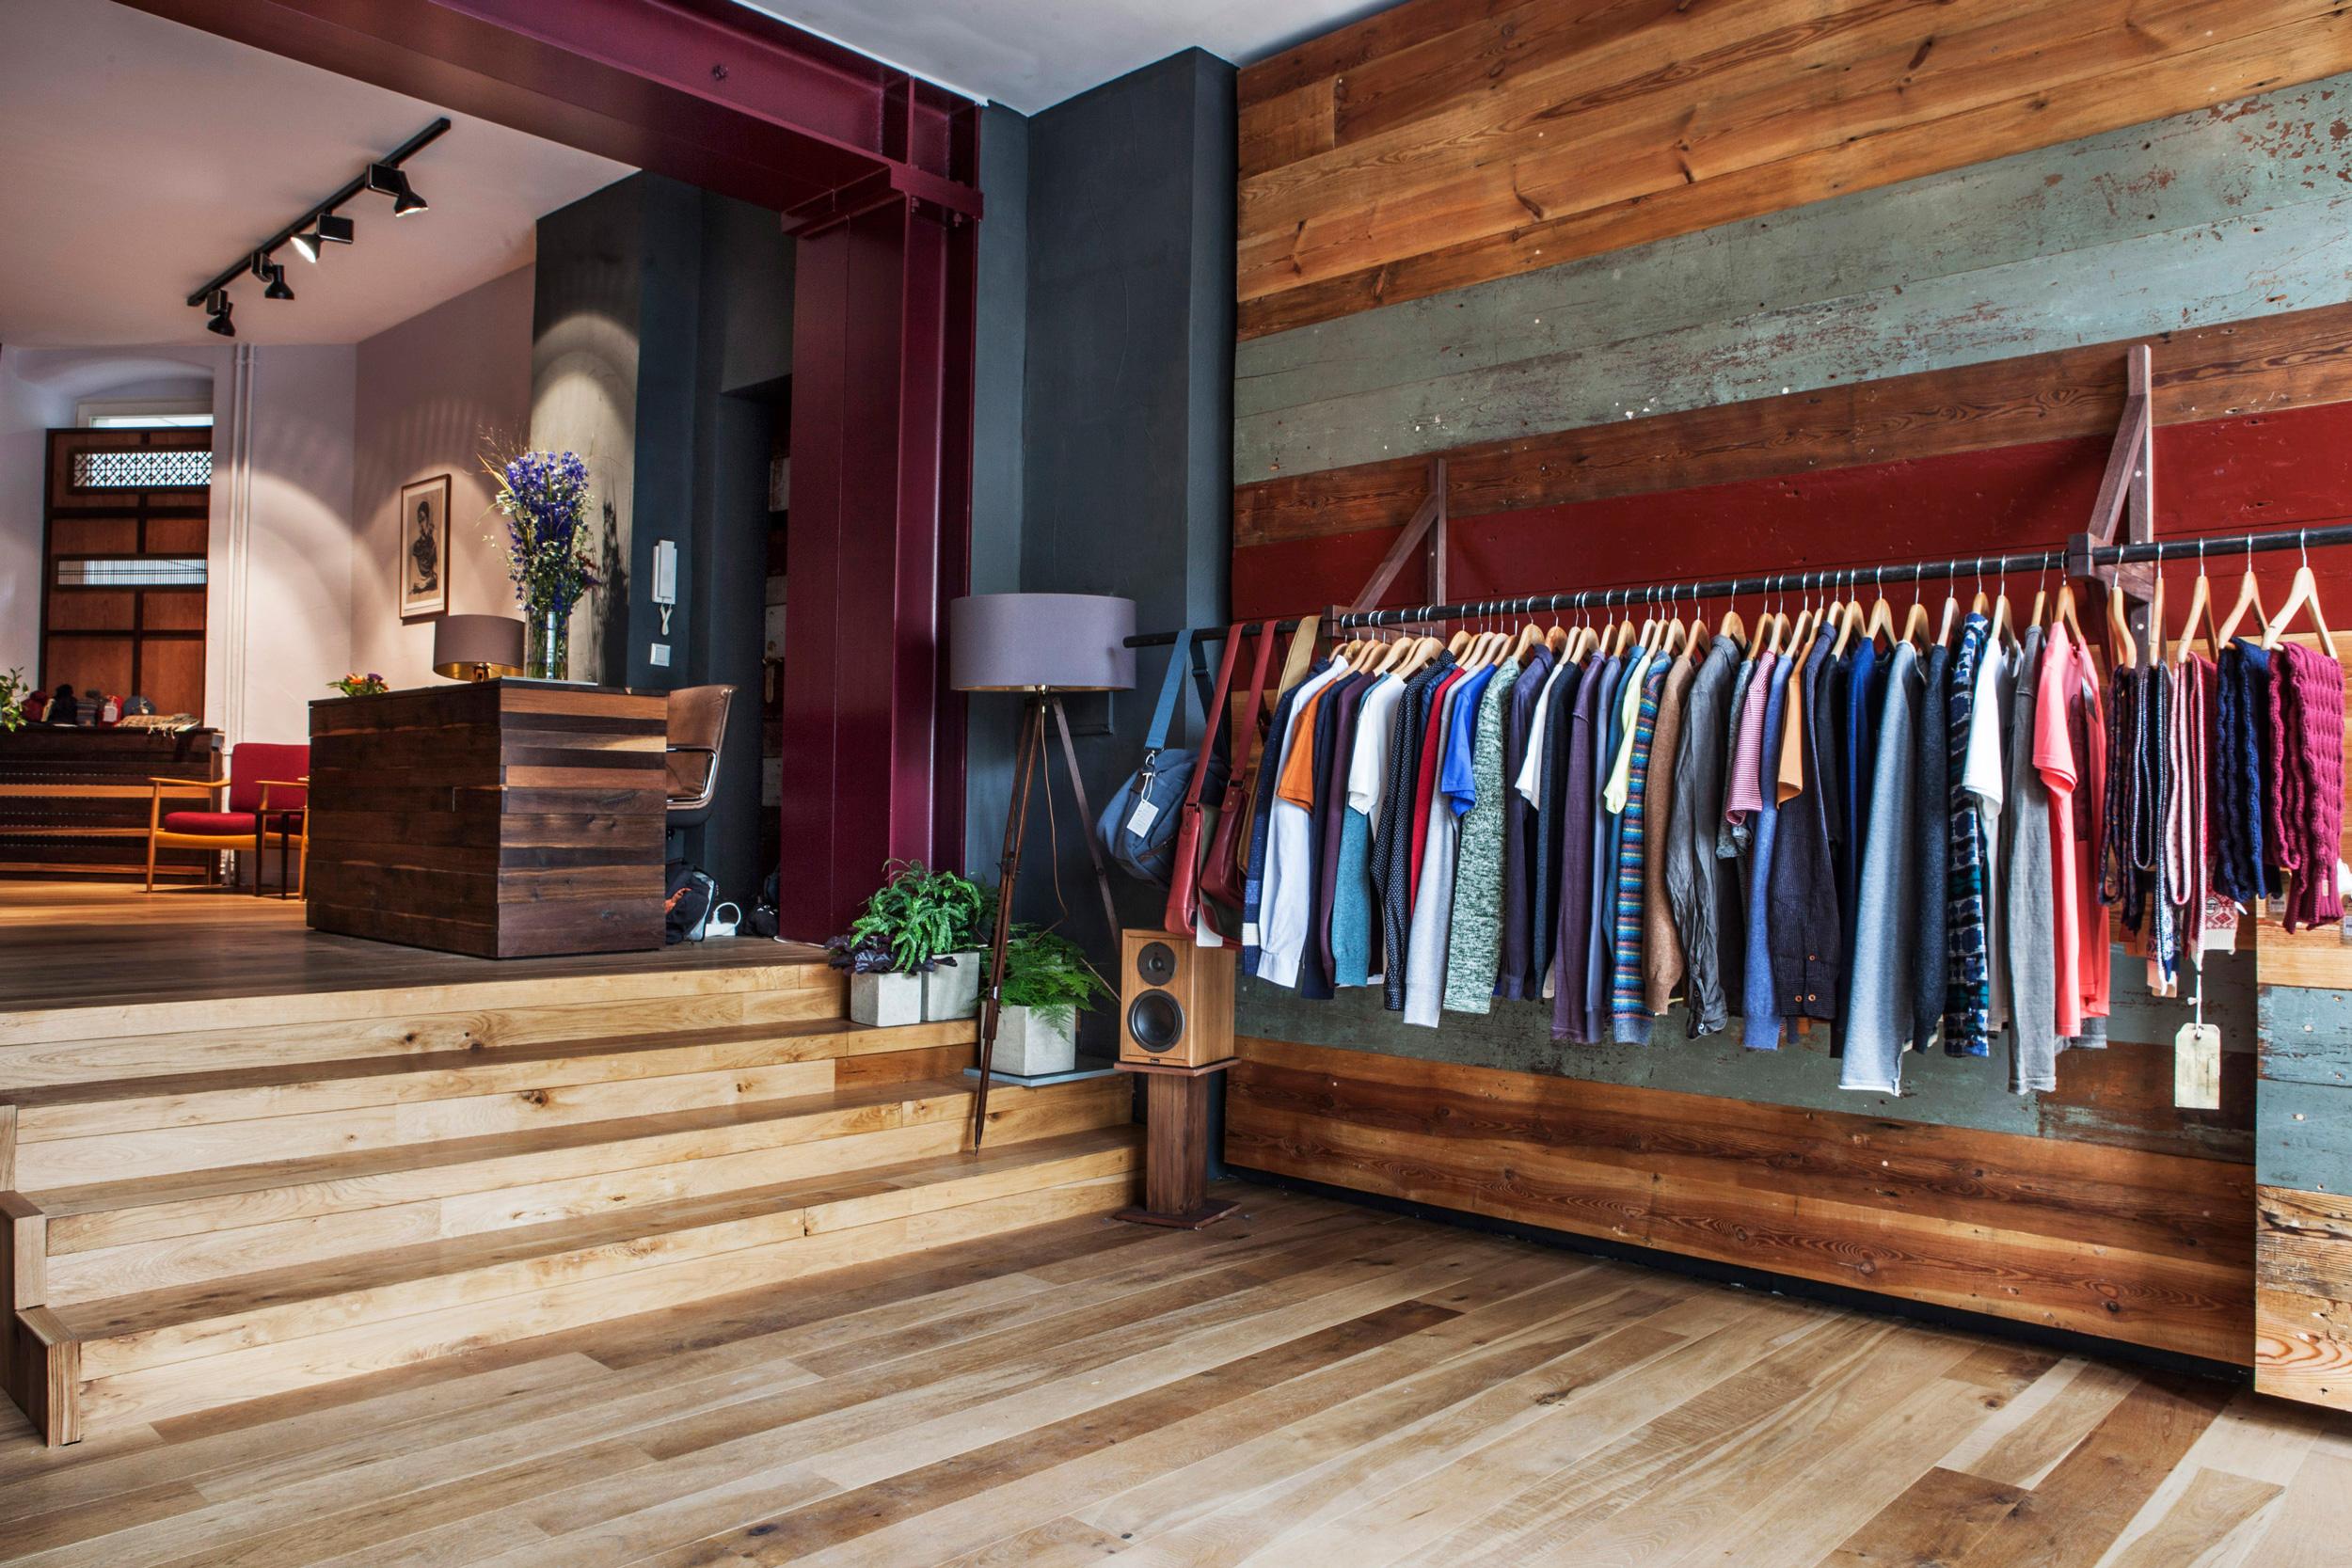 depozitul de haine second hand